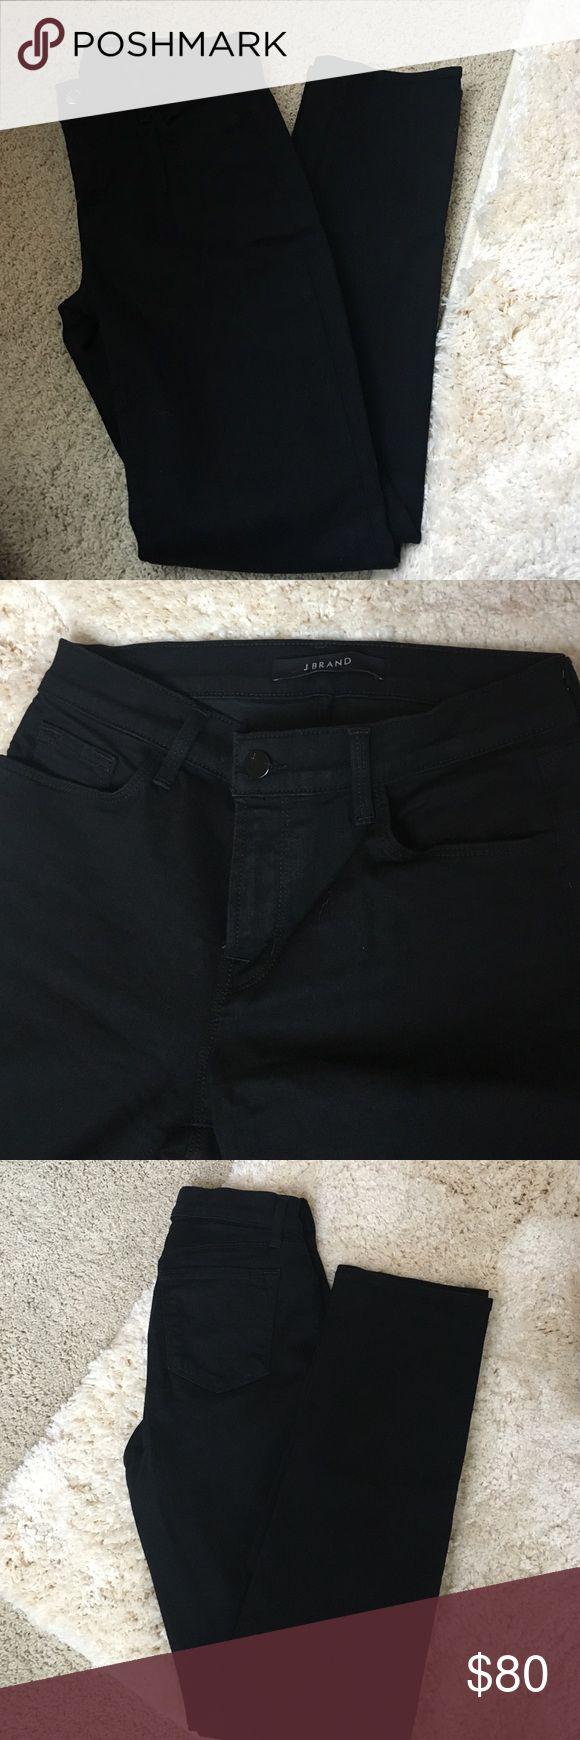 J Brand Vanity Black J Brand Vanity straight leg jeans. Only worn a couple times. Great condition! J Brand Jeans Straight Leg